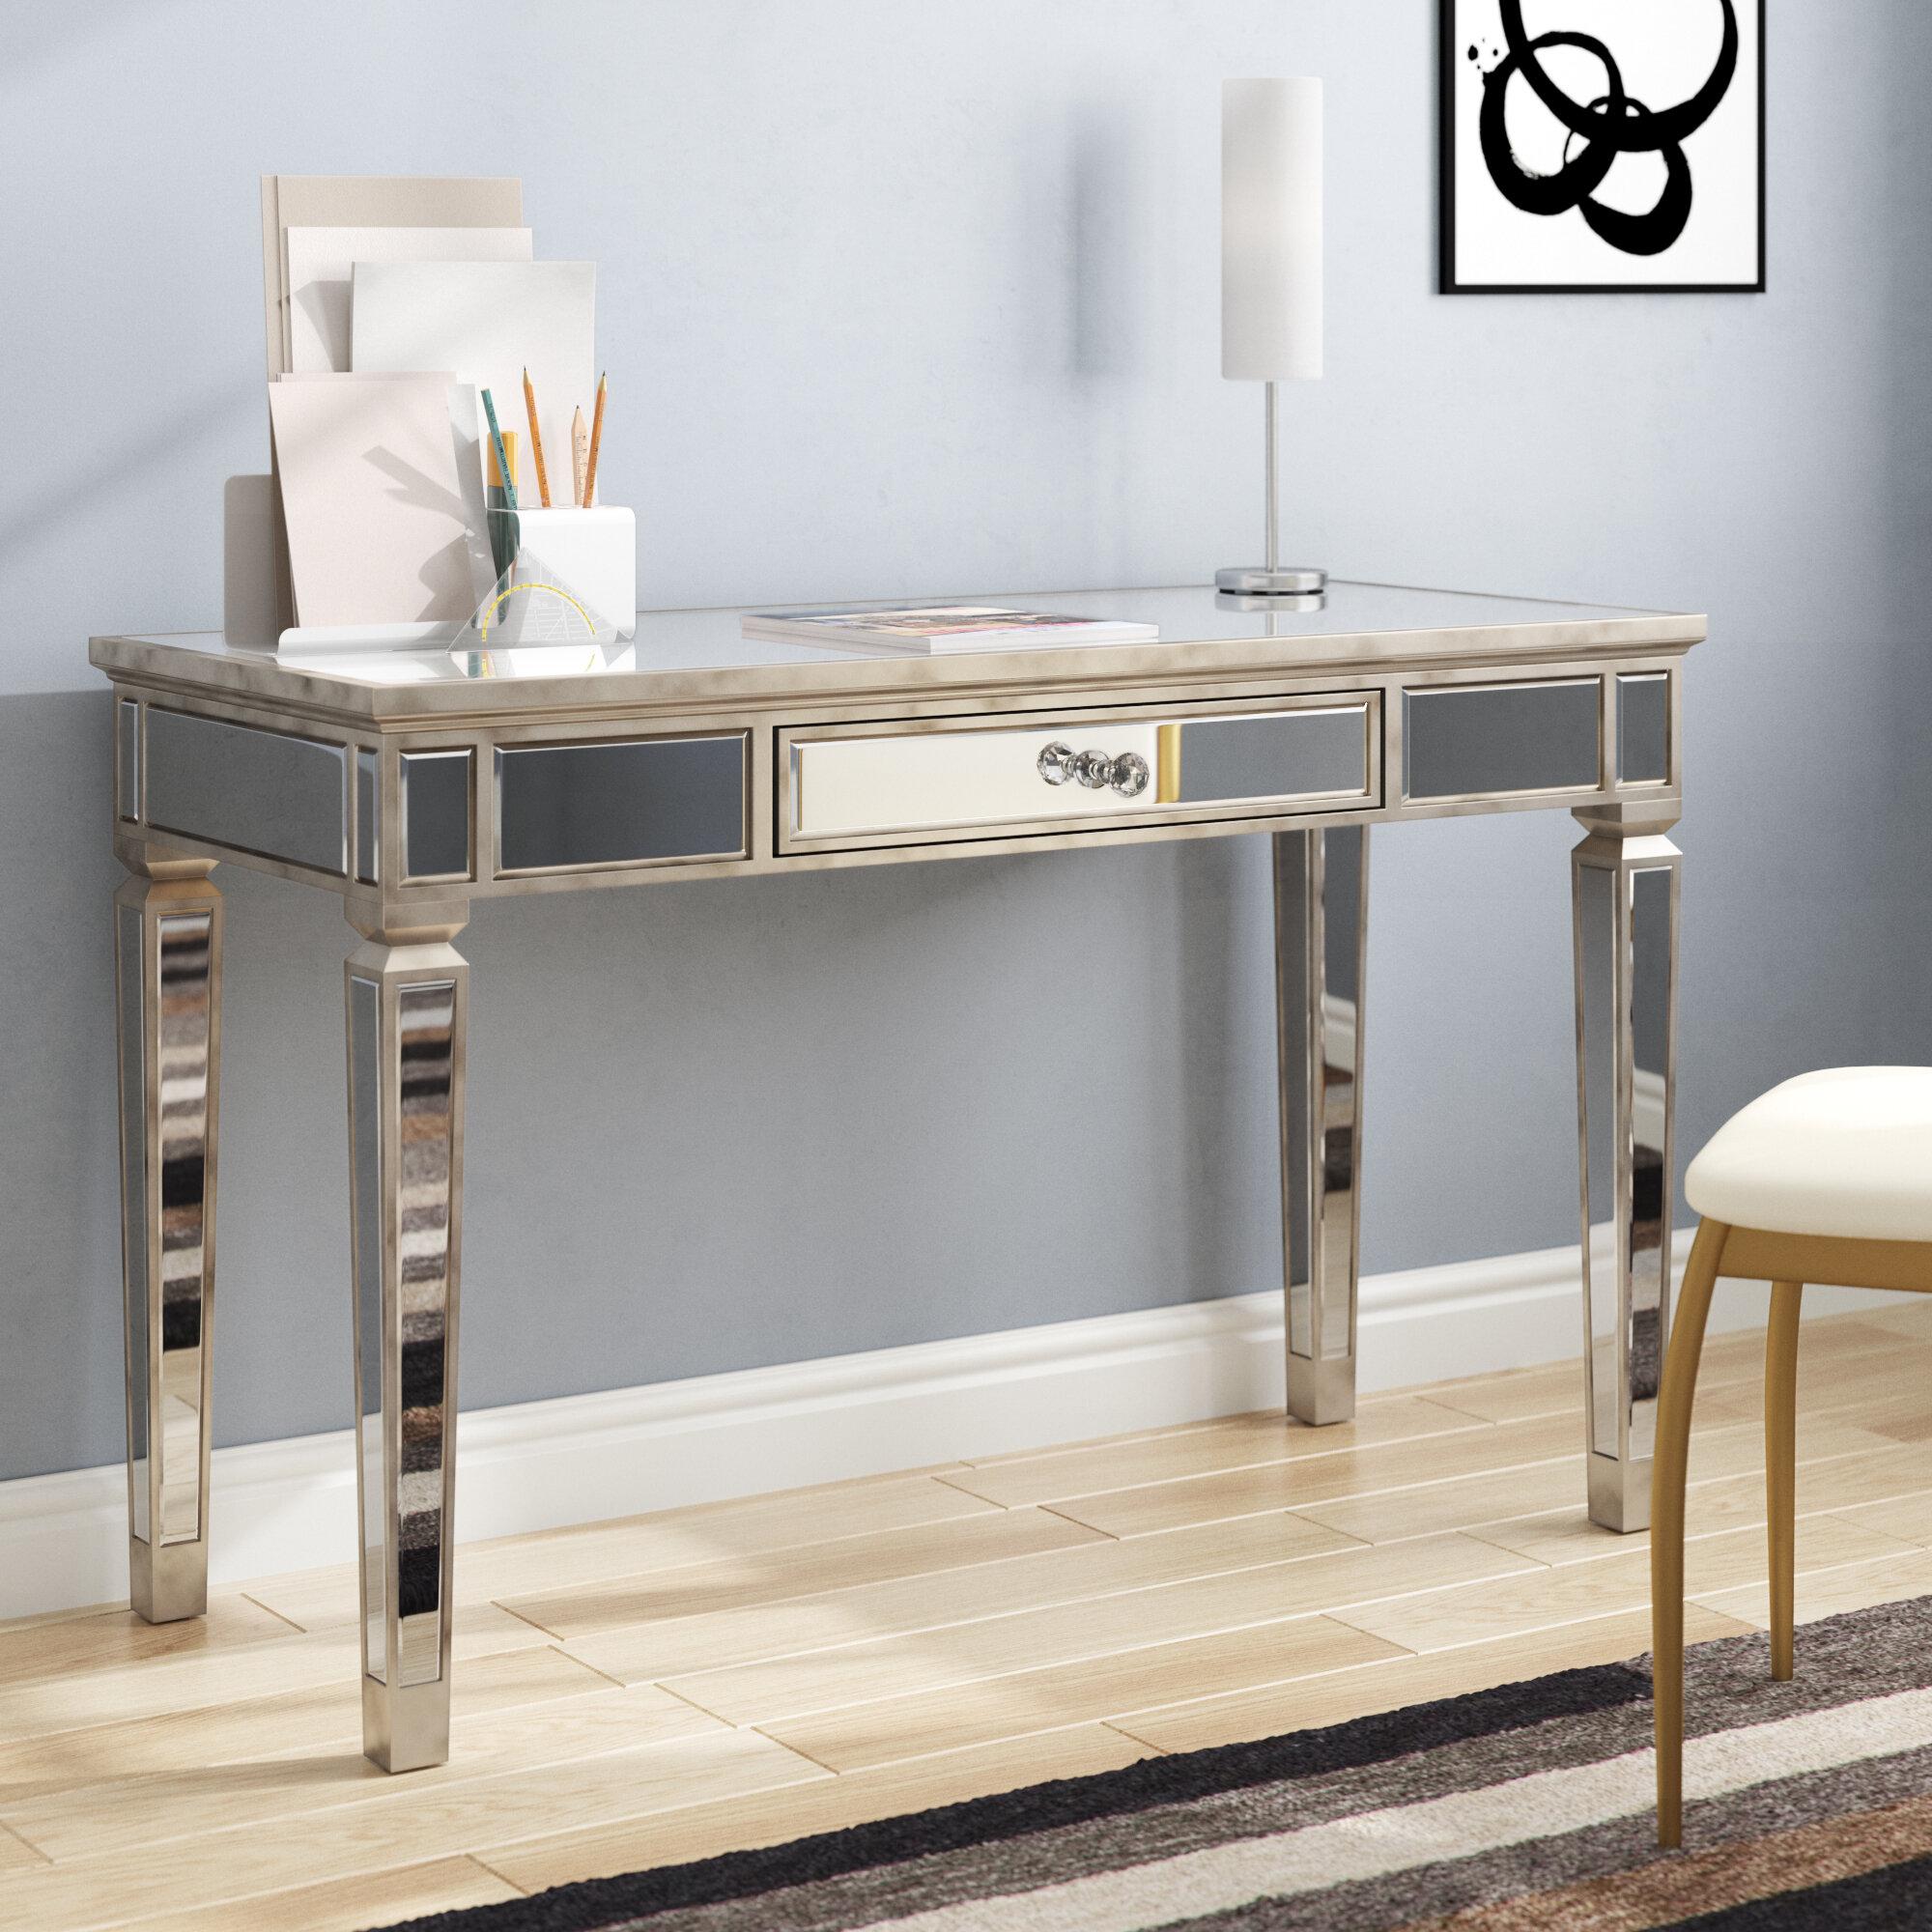 Fabulous Assembled Desks Youll Love In 2019 Wayfair Interior Design Ideas Skatsoteloinfo